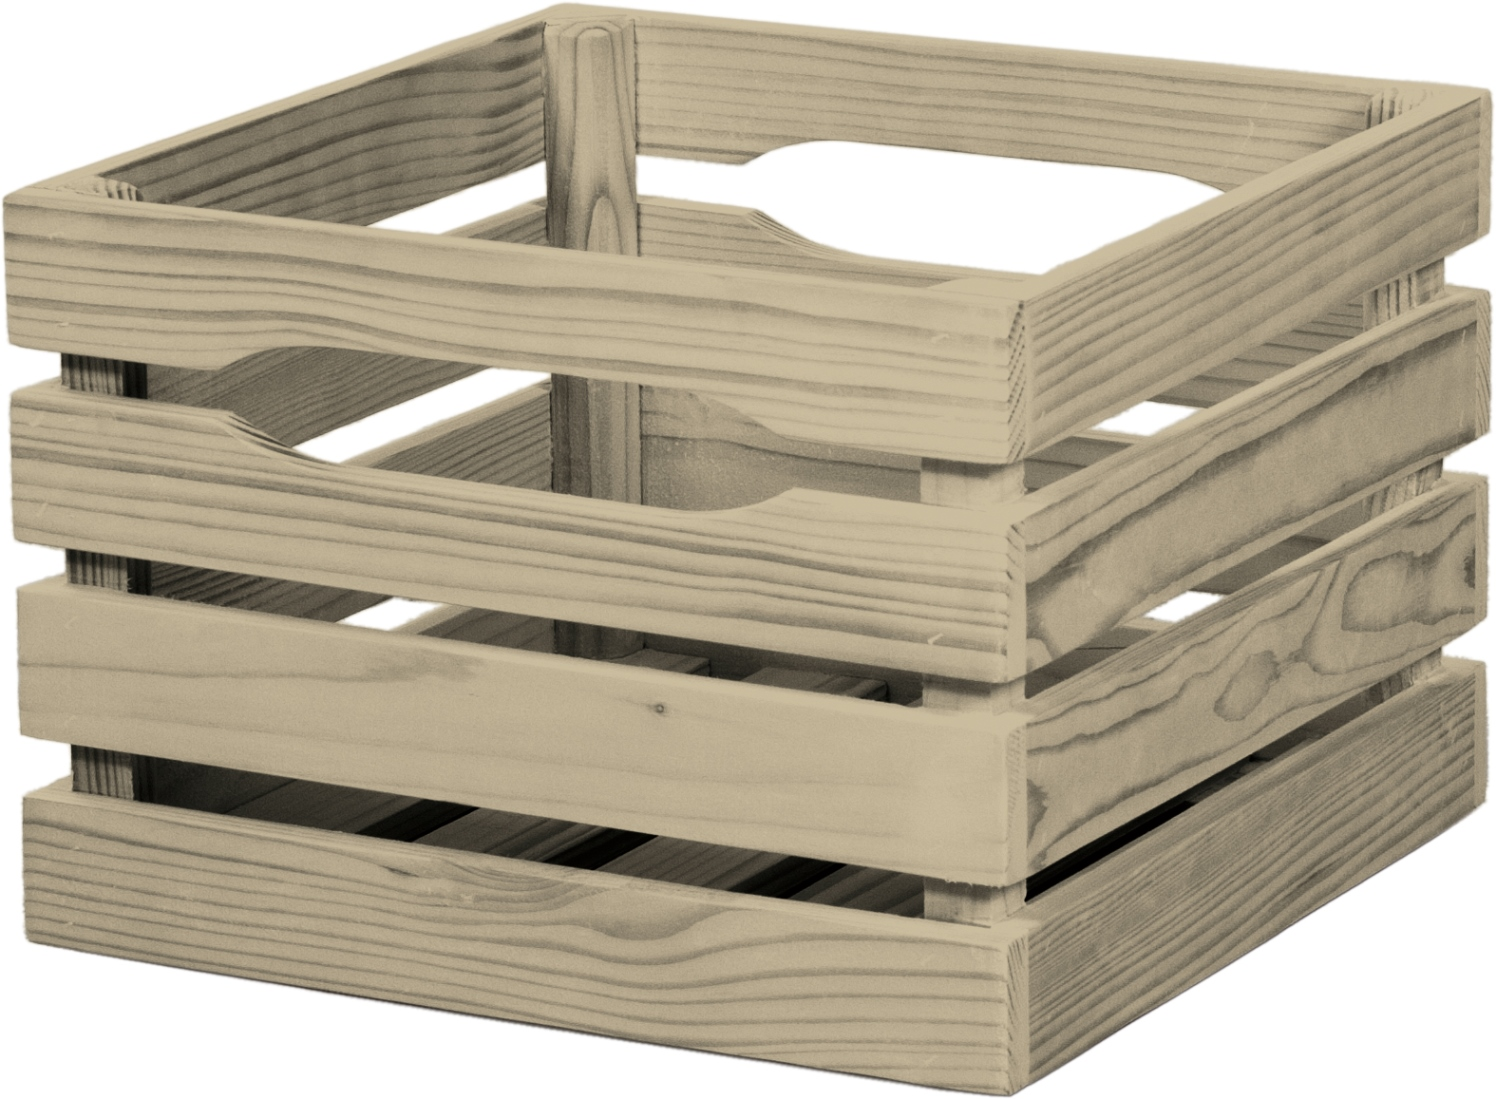 STORAGE BOX MEDIUM  w 28 x d 28 x h 20 cm  € 27  Product Code: BOX-M